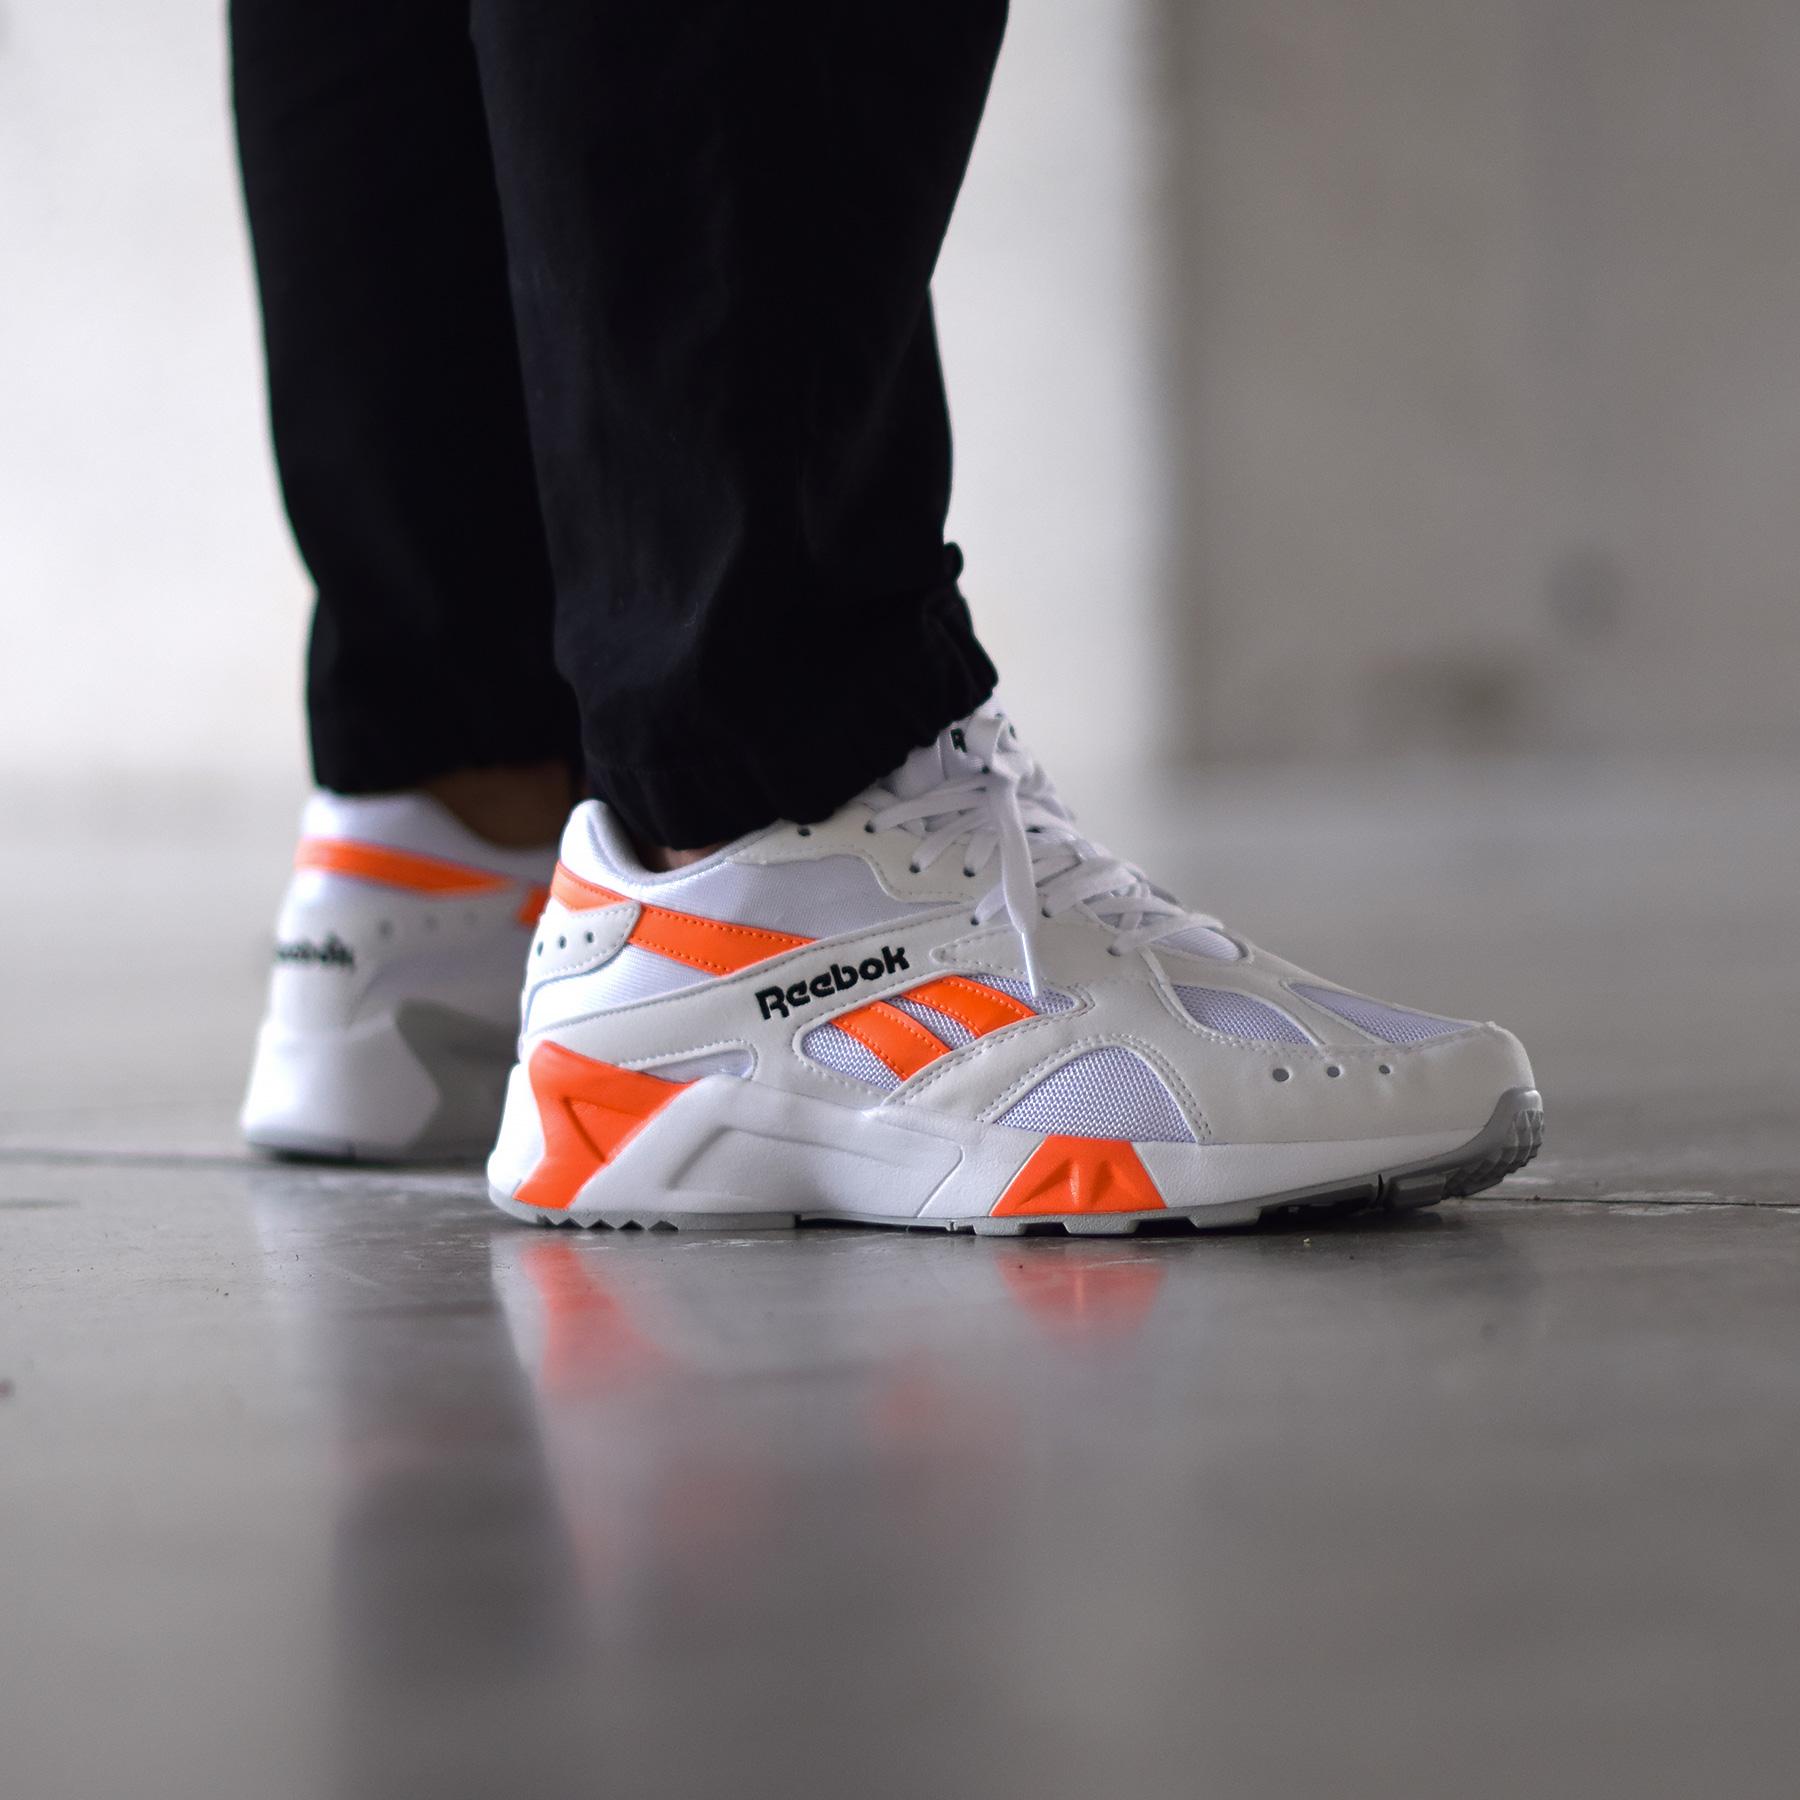 ac68143d49b0 Reebok Aztrek - Fall 2018 - Sneakers.fr